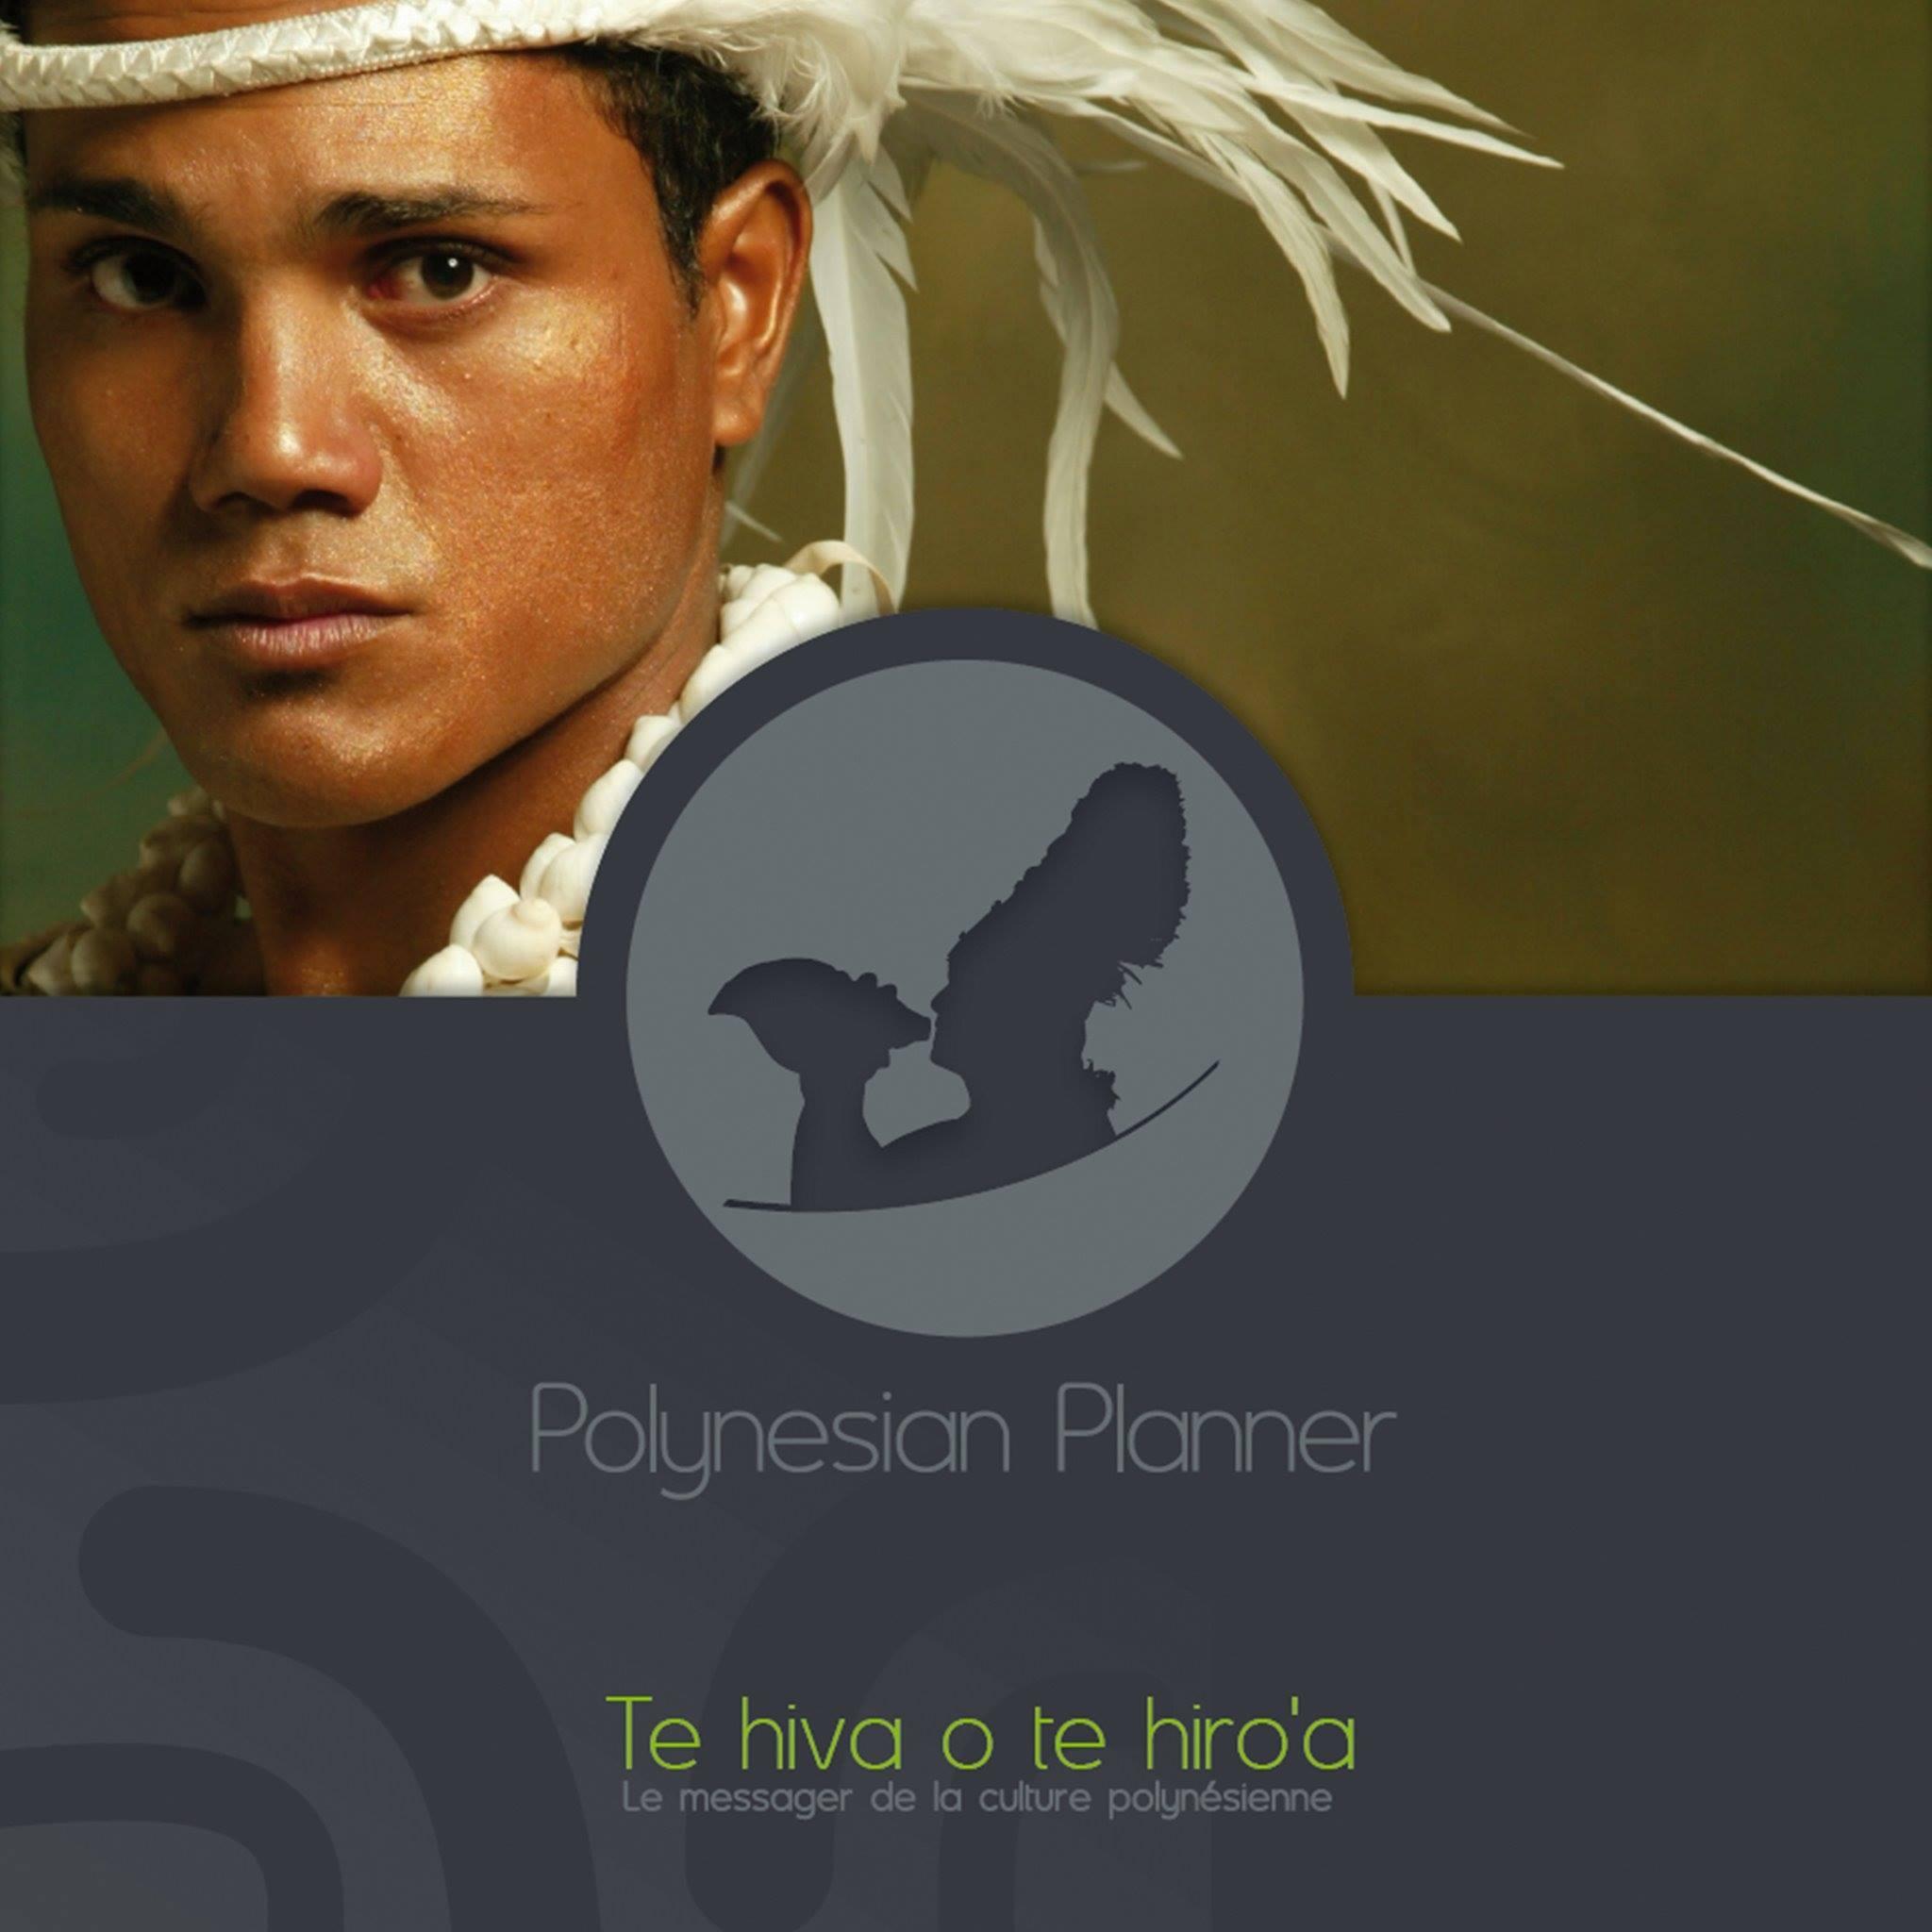 https://tahititourisme.com/wp-content/uploads/2017/08/polynesianplannerphotodeprofil.jpg